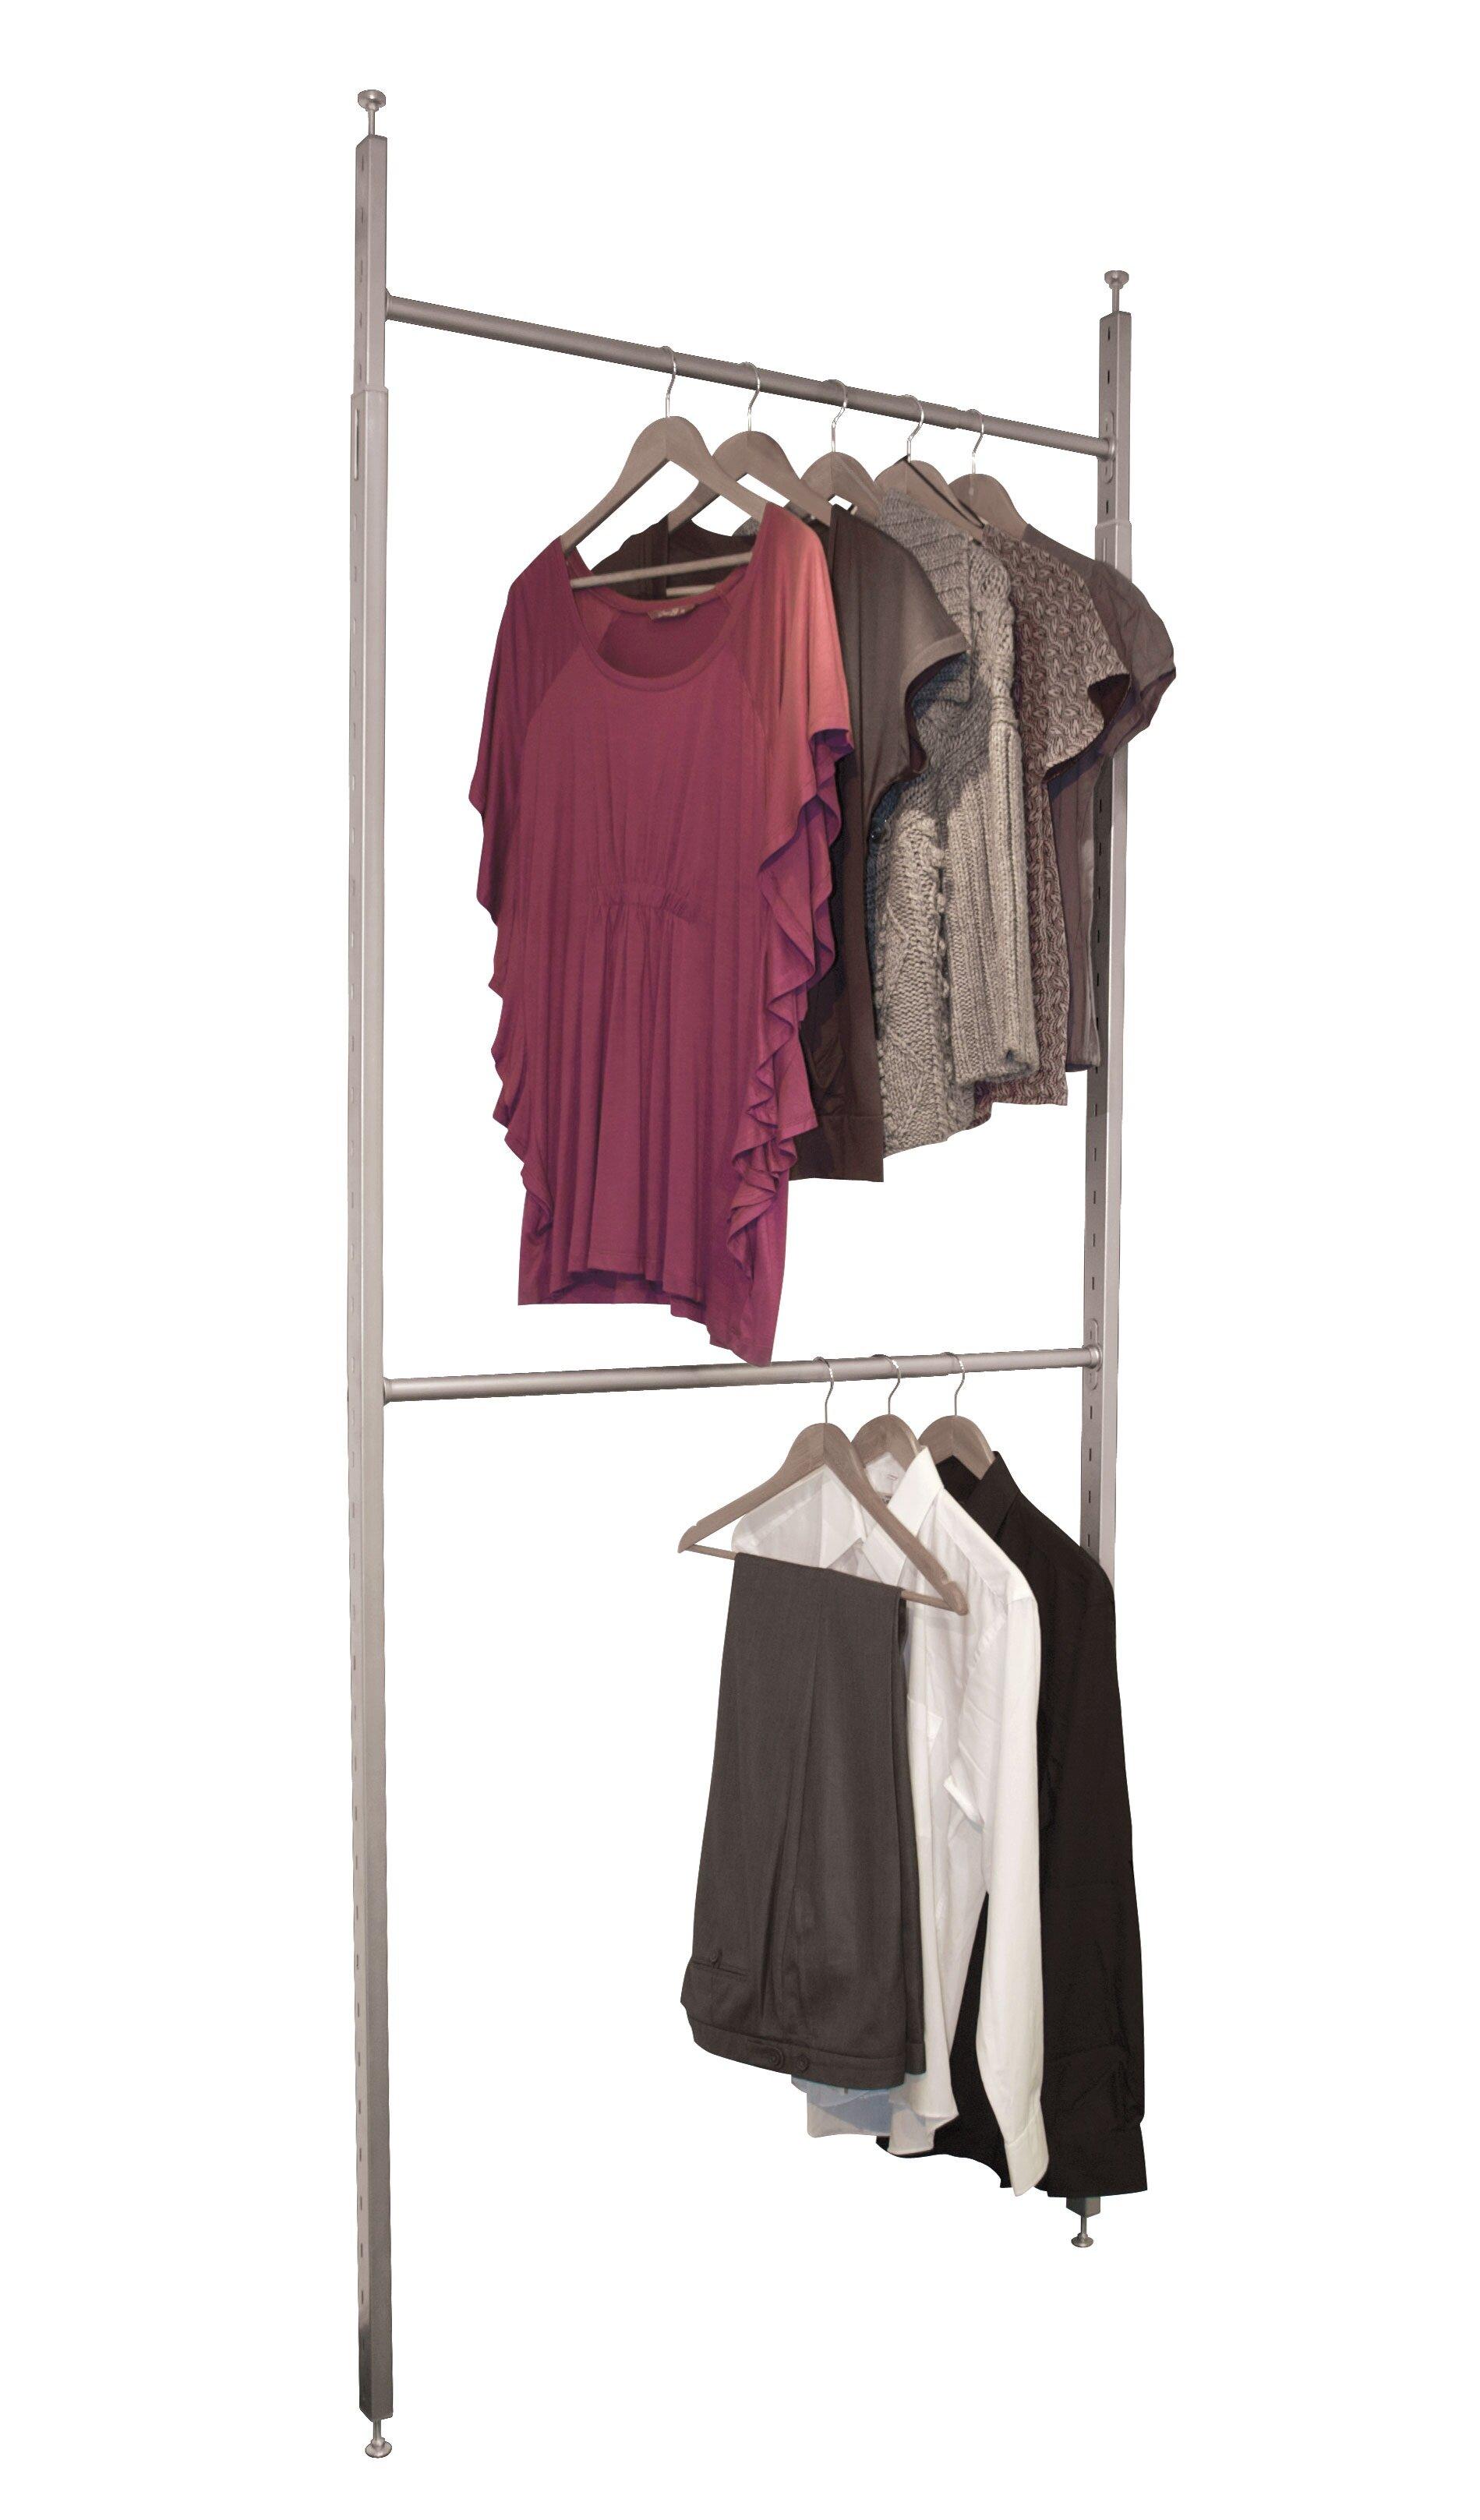 single cloth metal pole monsoon gift ikea rack dryer rain clothes white rigga itm telescopic